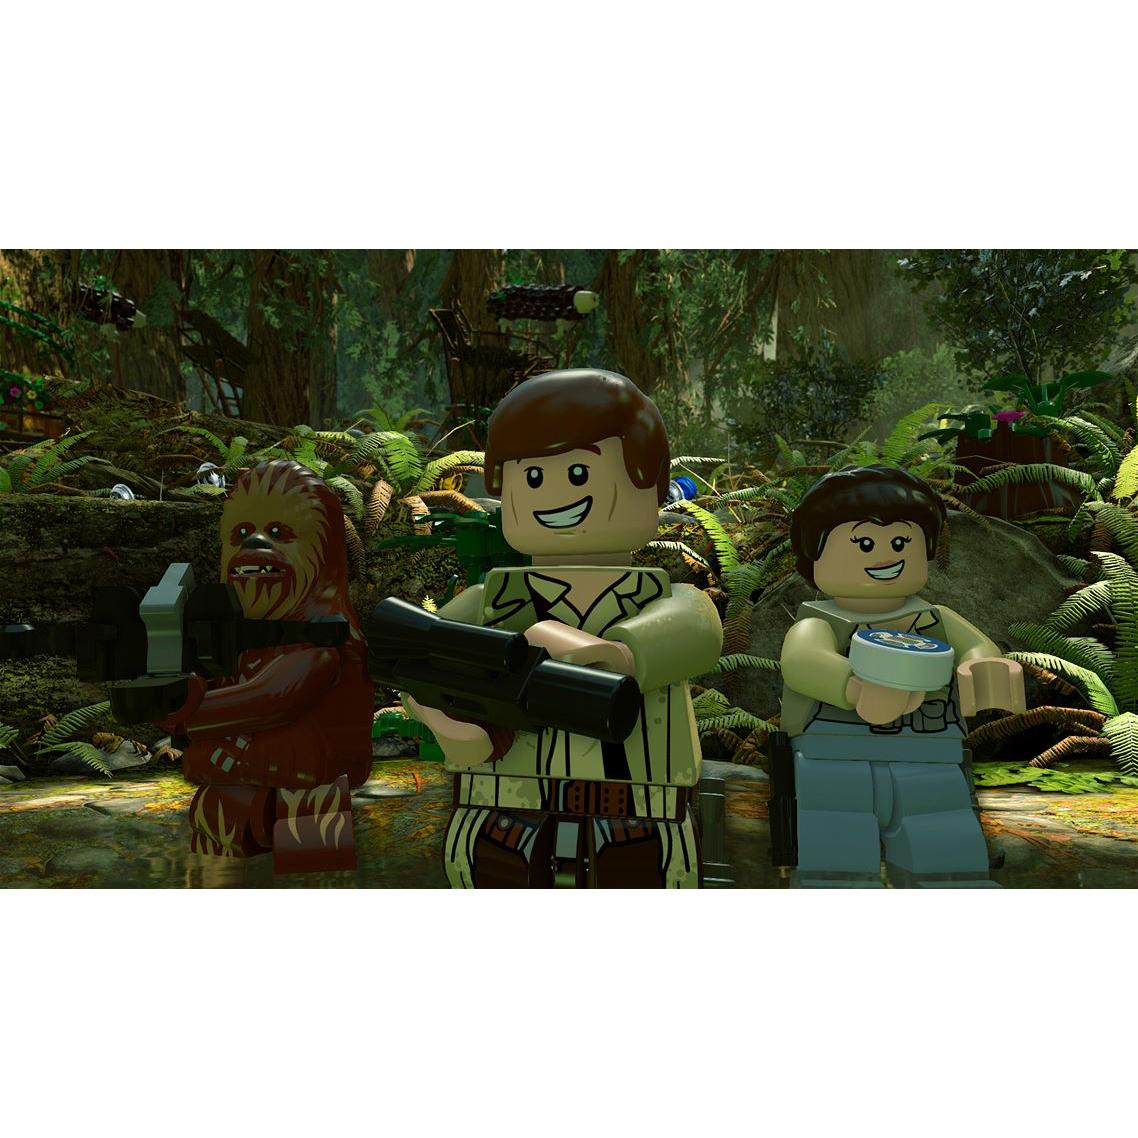 Joc LEGO : STAR WARS THE FORCE AWAKENS pentru PC 1